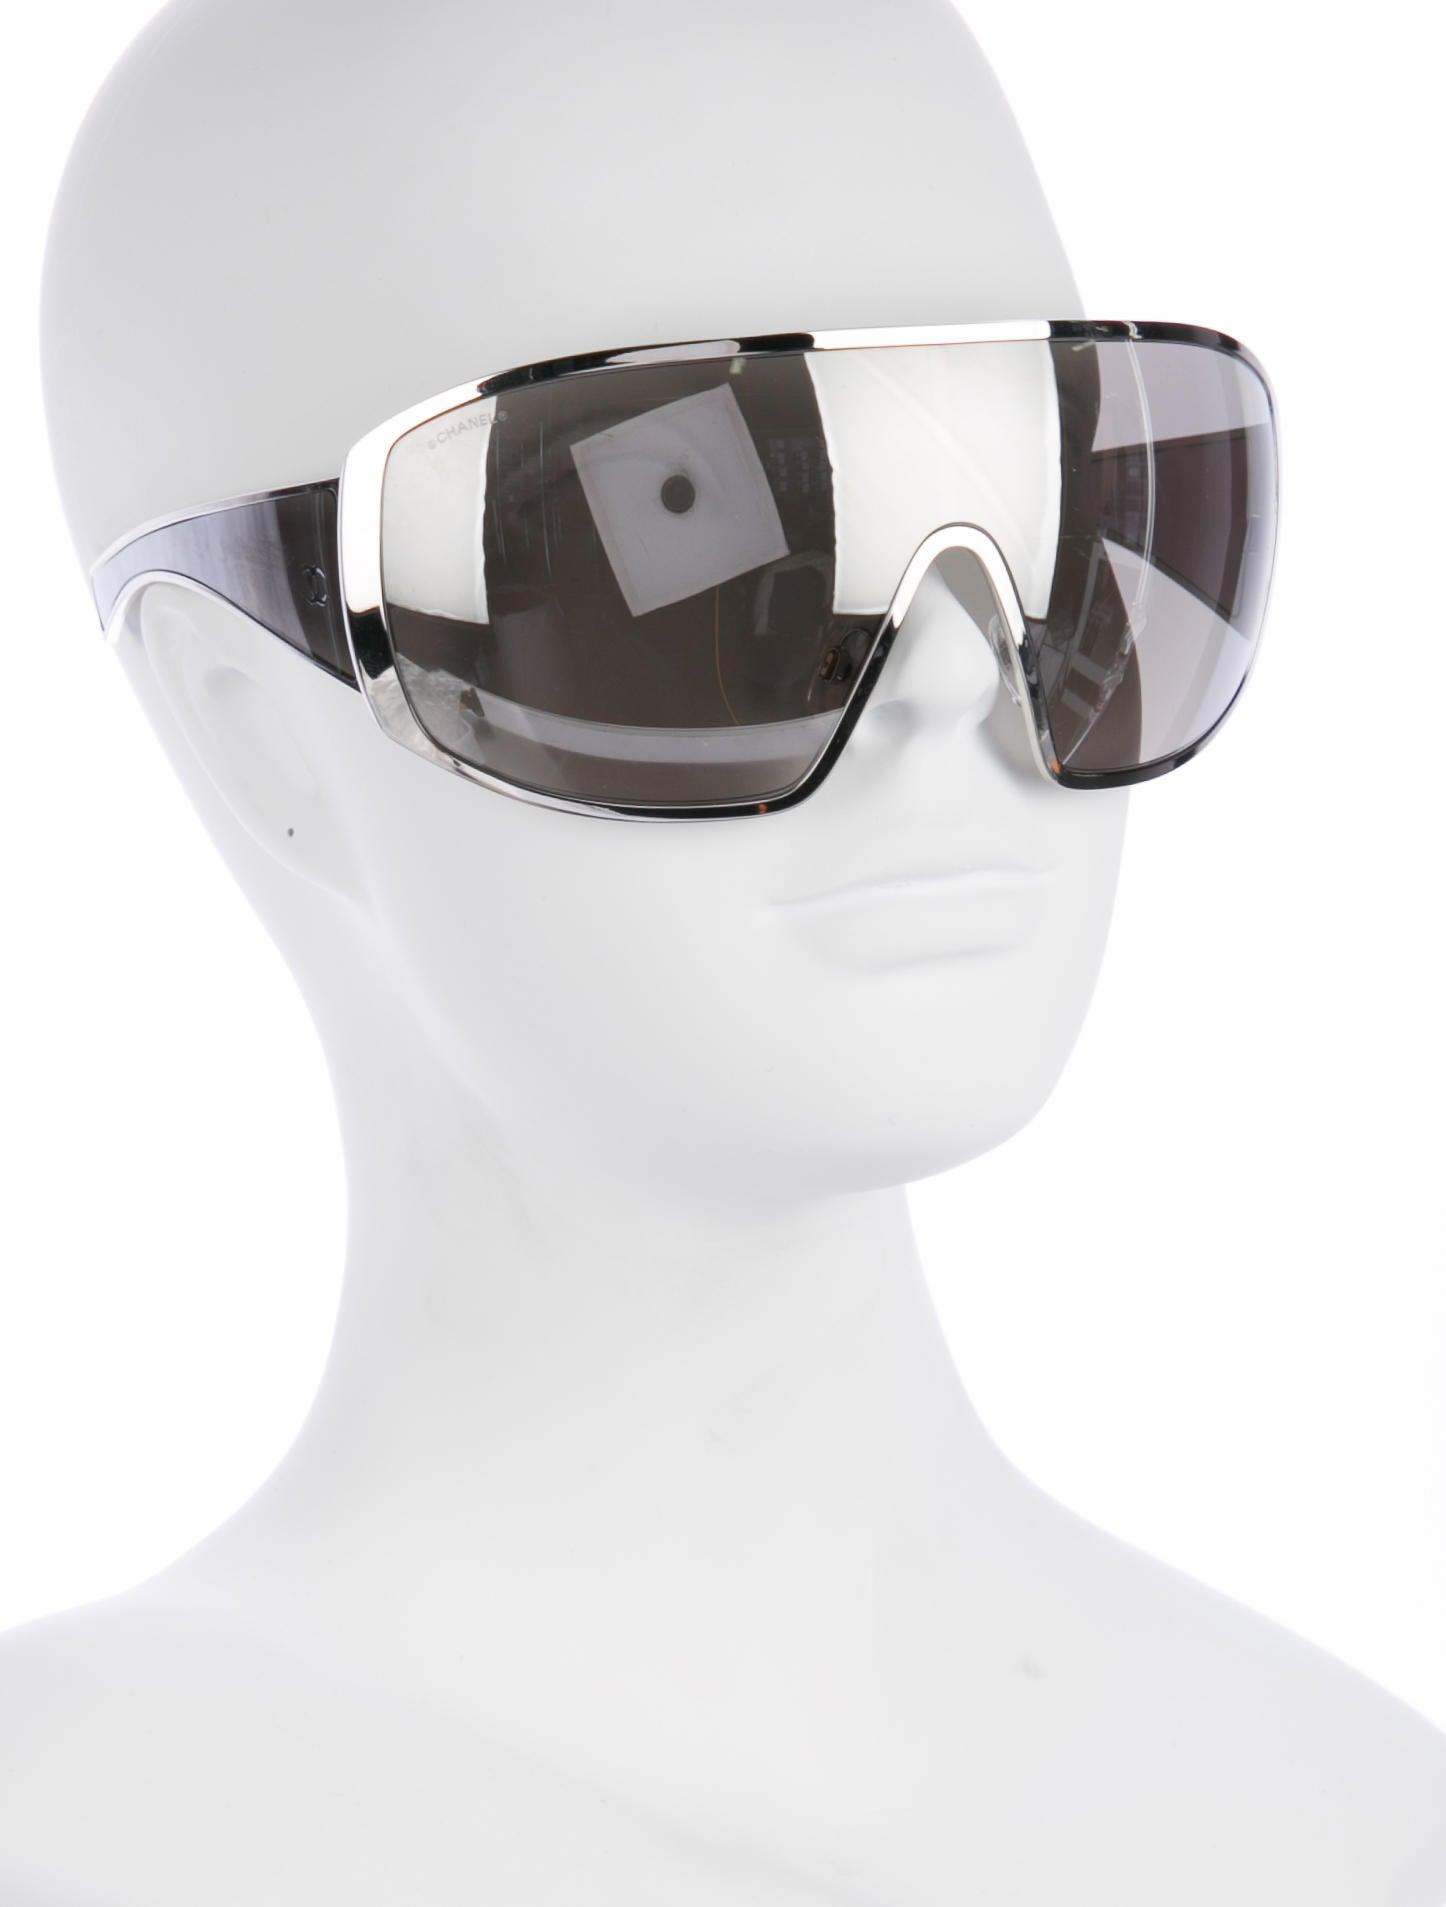 Chanel 2017 Shield Runway Sunglasses - Accessories ...